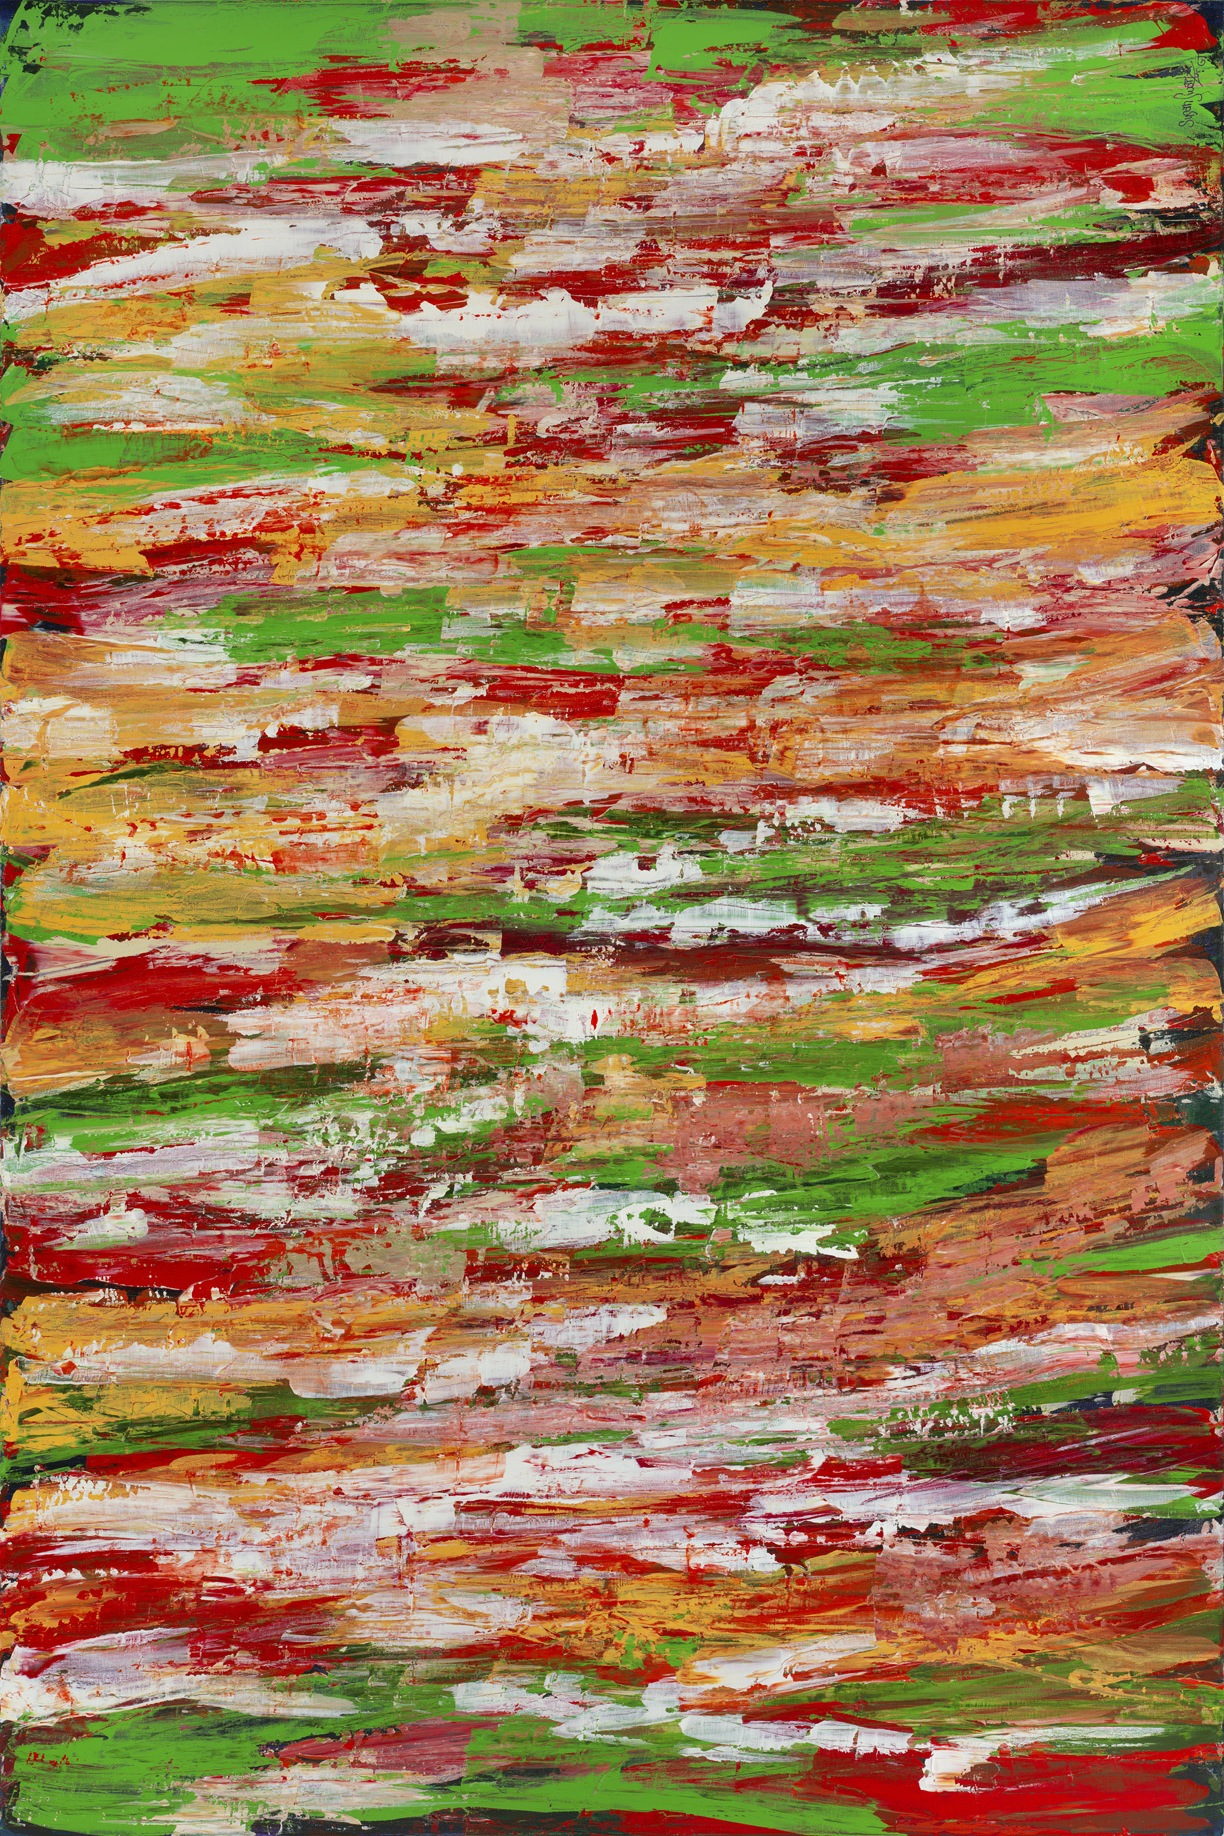 Landscape of Resonances 011